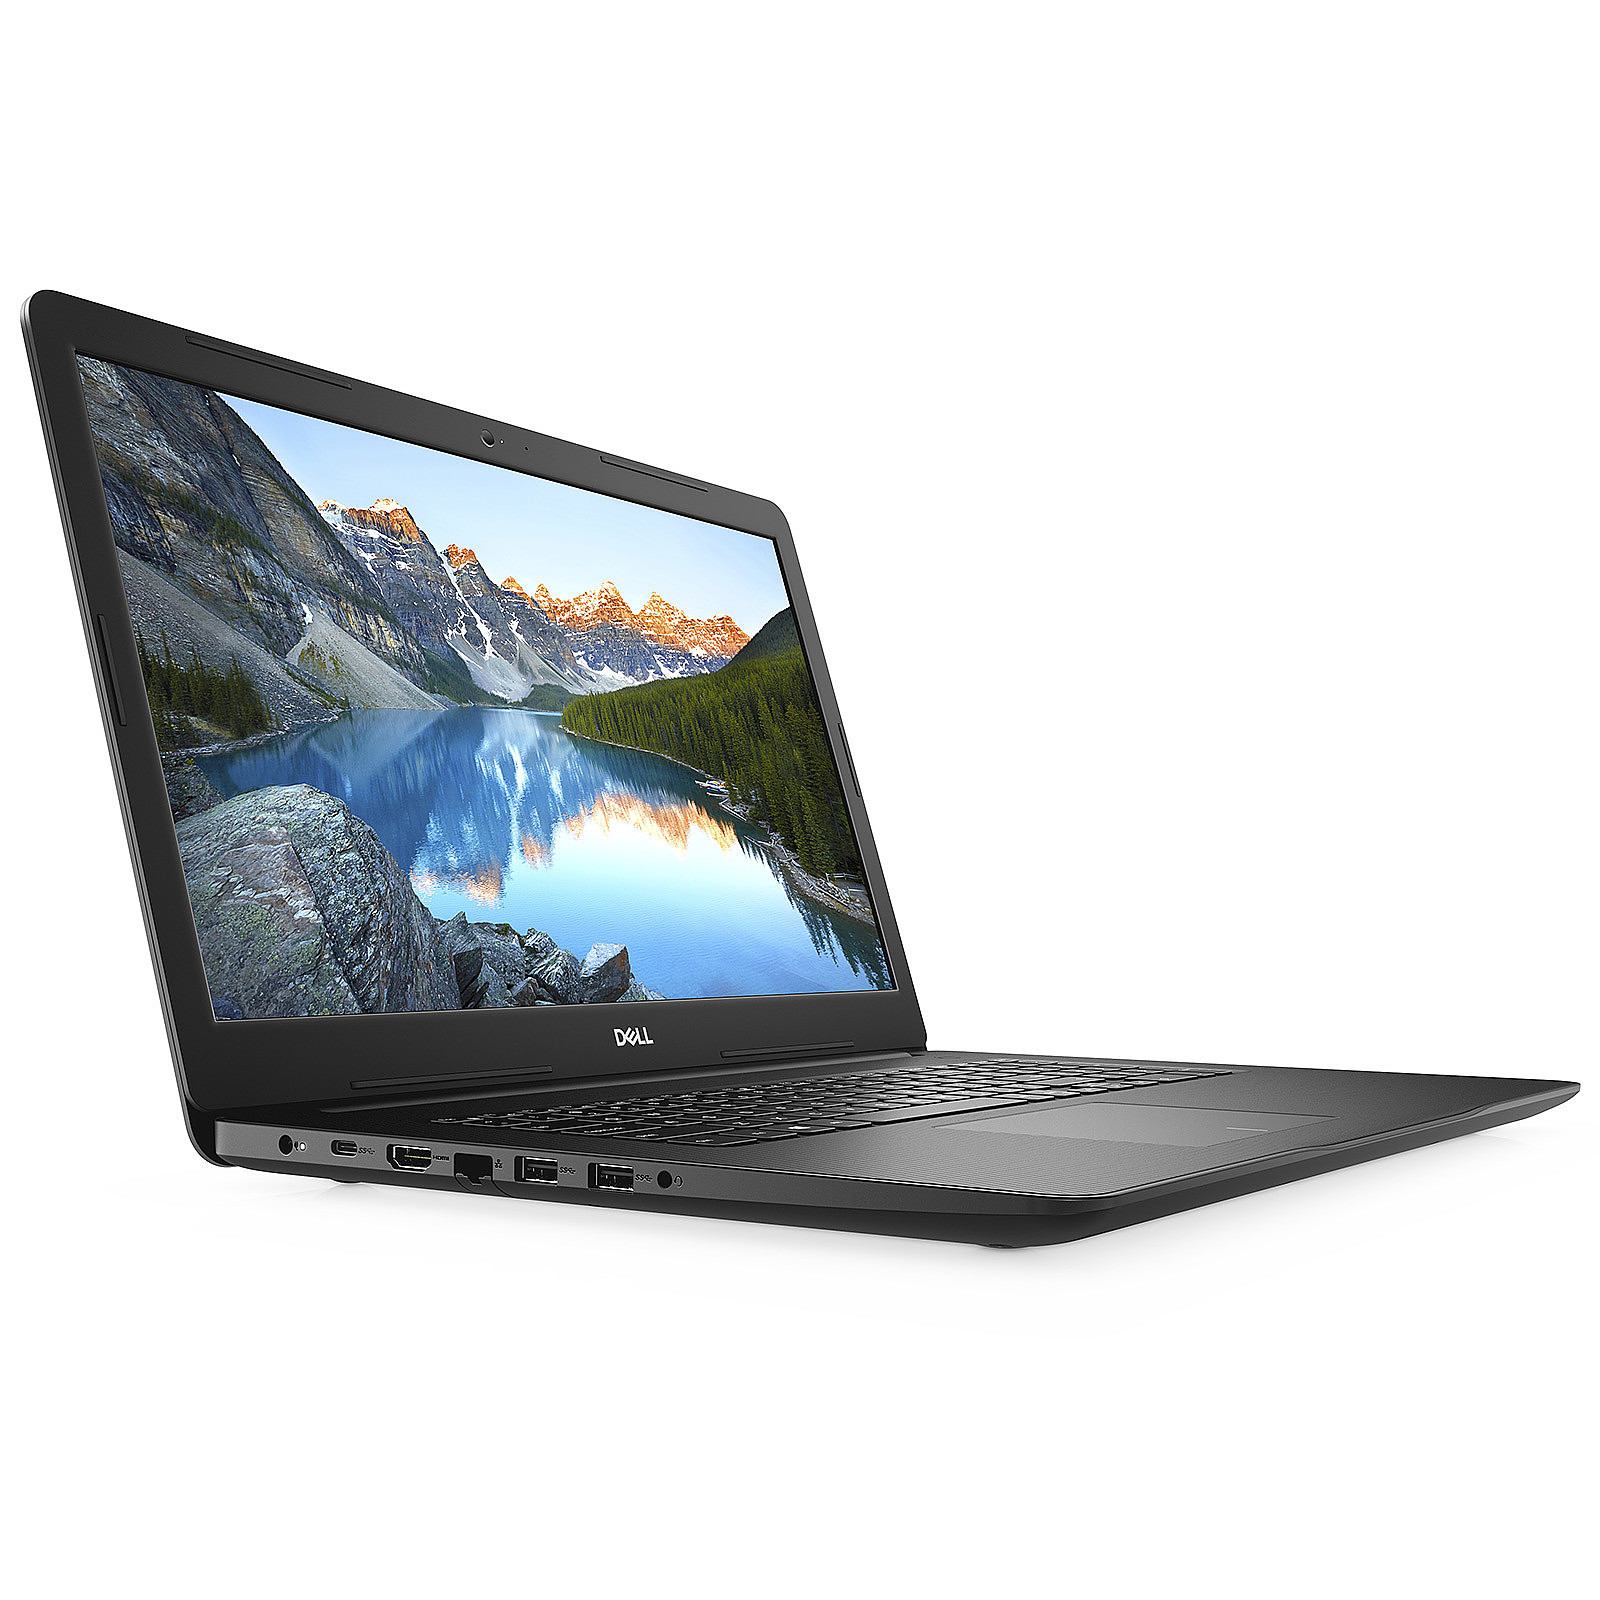 Dell Inspiron 17 3793 (6RHPP)